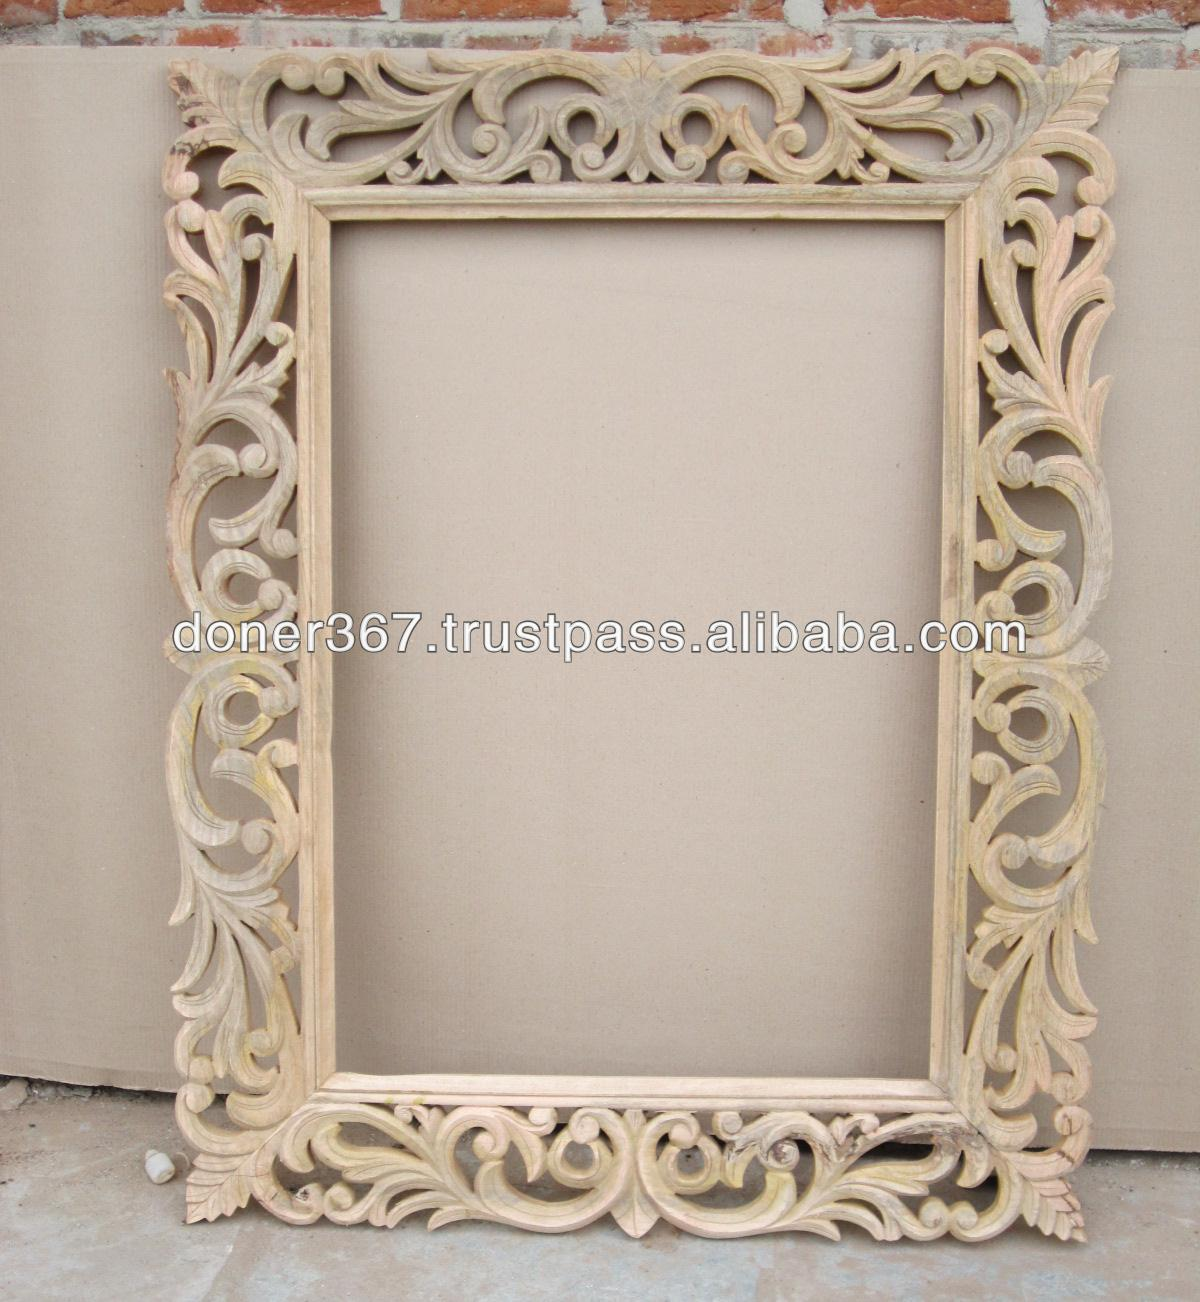 Wooden Big Hand Carved Mirror Frame Buy Big Size Wooden